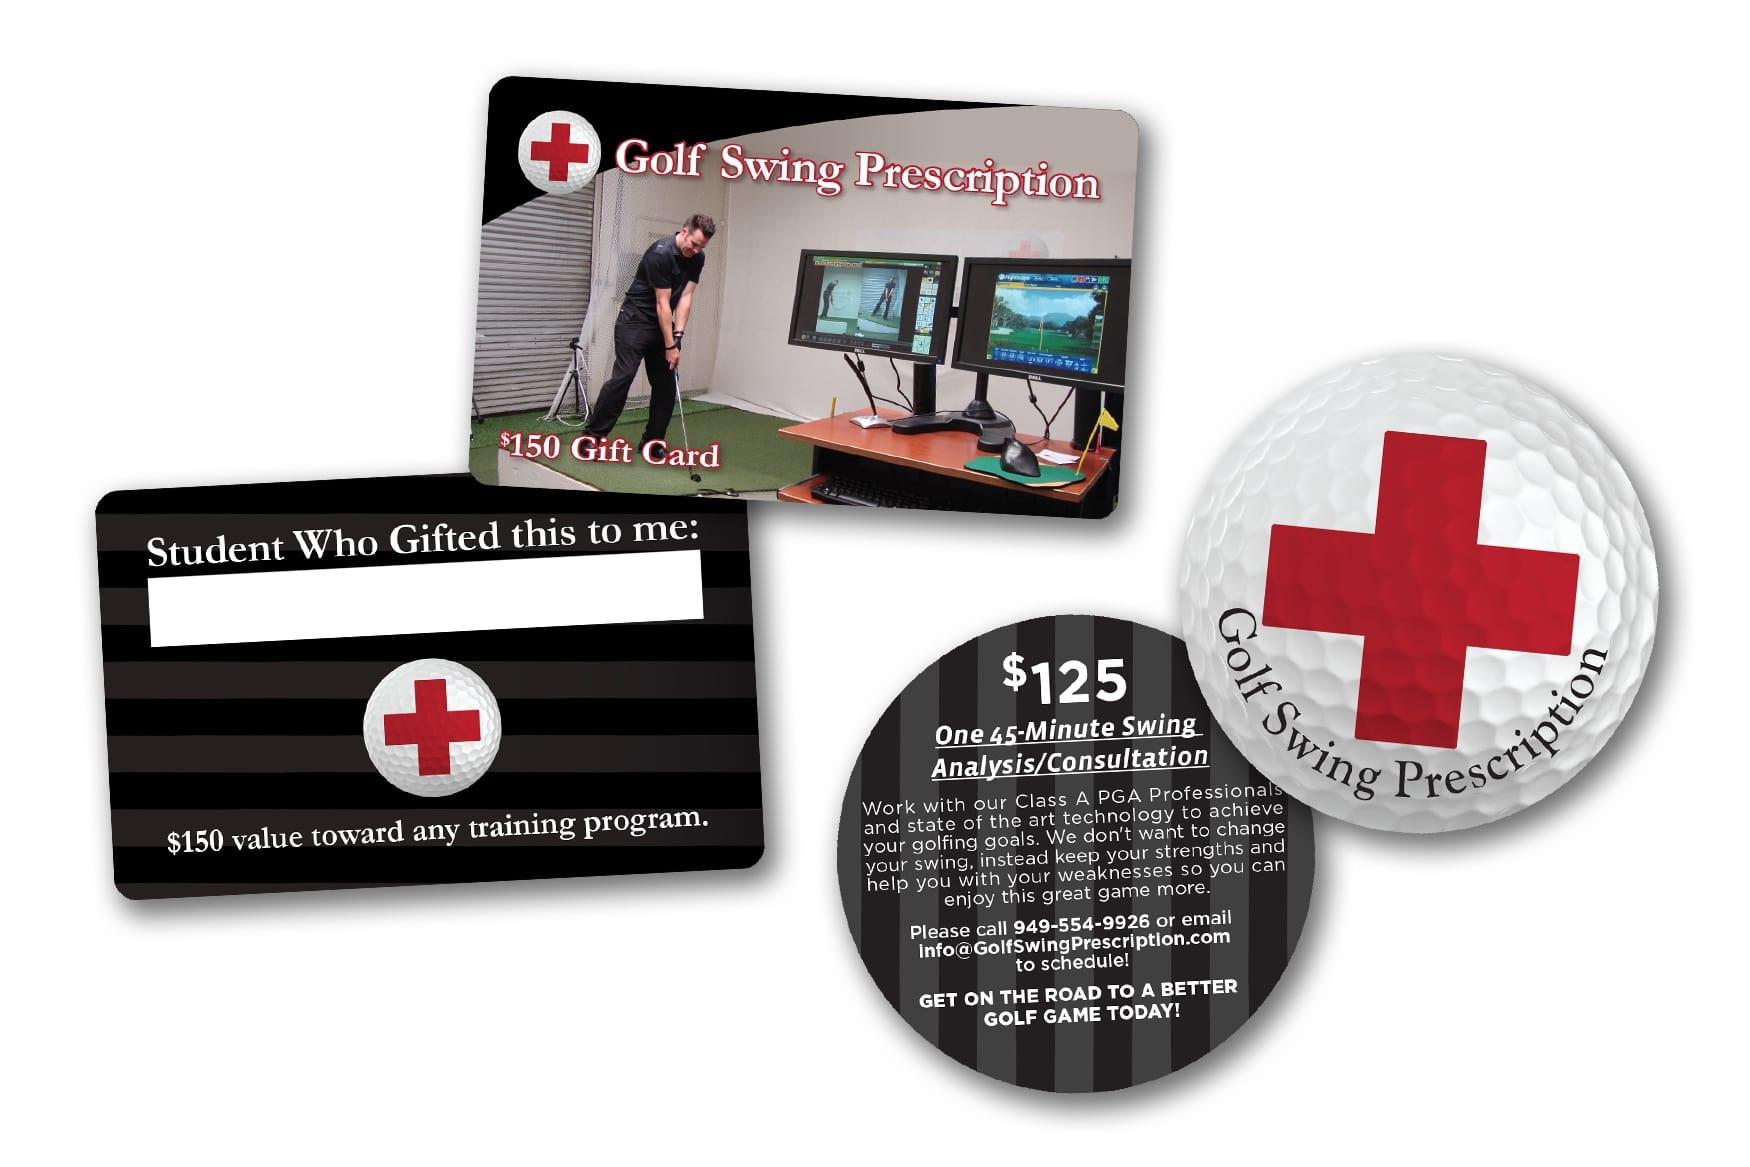 Face Value Golf Gift Cards for Golf Swing Prescription